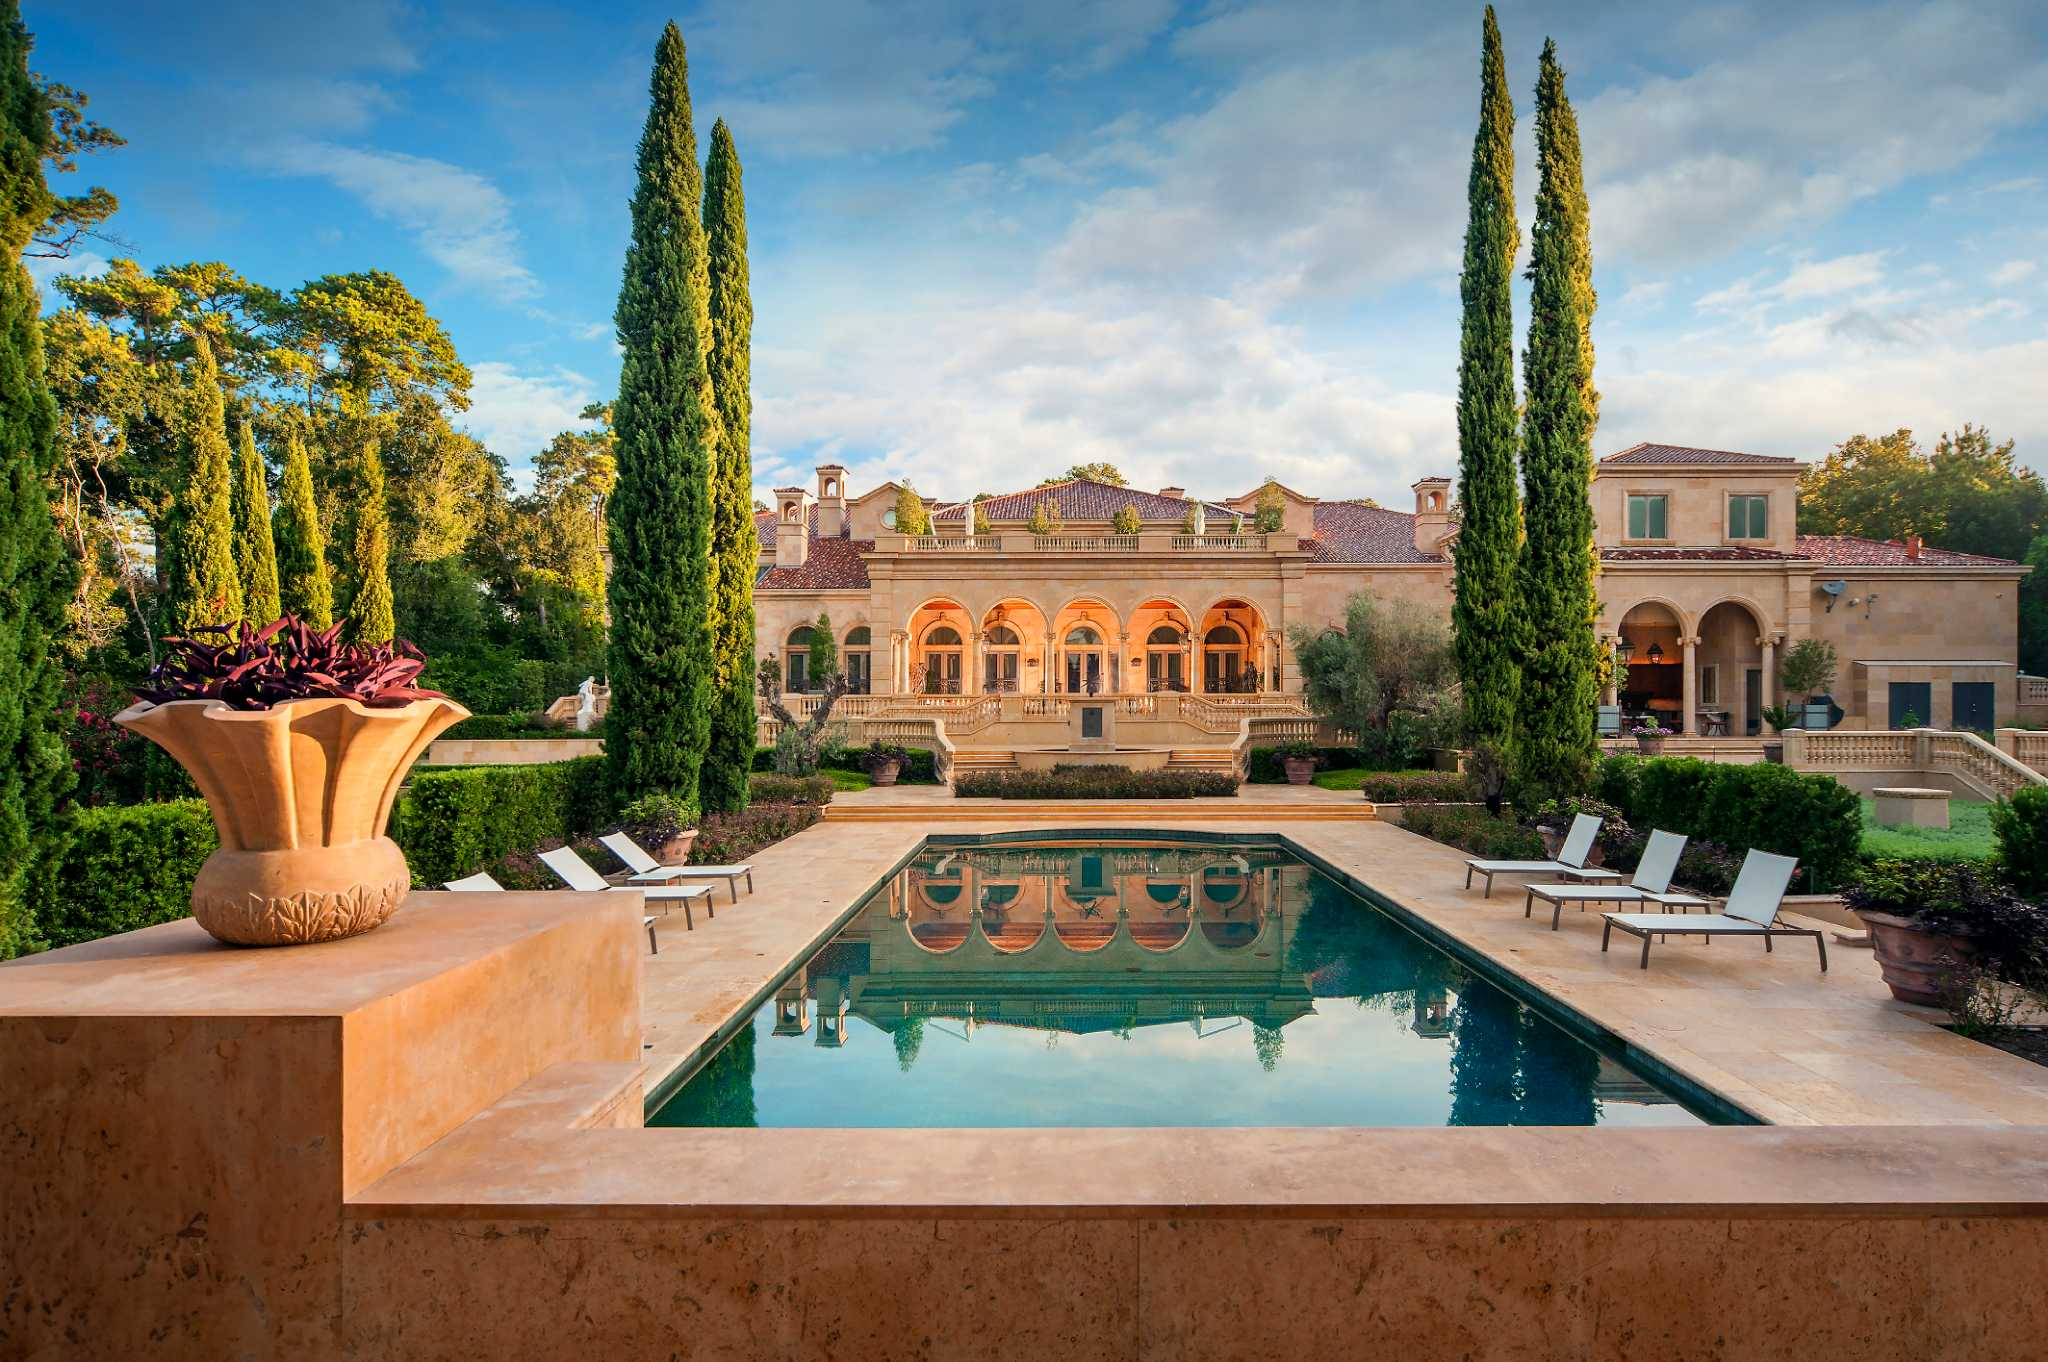 Best Kitchen Gallery: At 43 Million Mansion Listing Breaks Houston Record Houston of Biggest House In Houston on rachelxblog.com